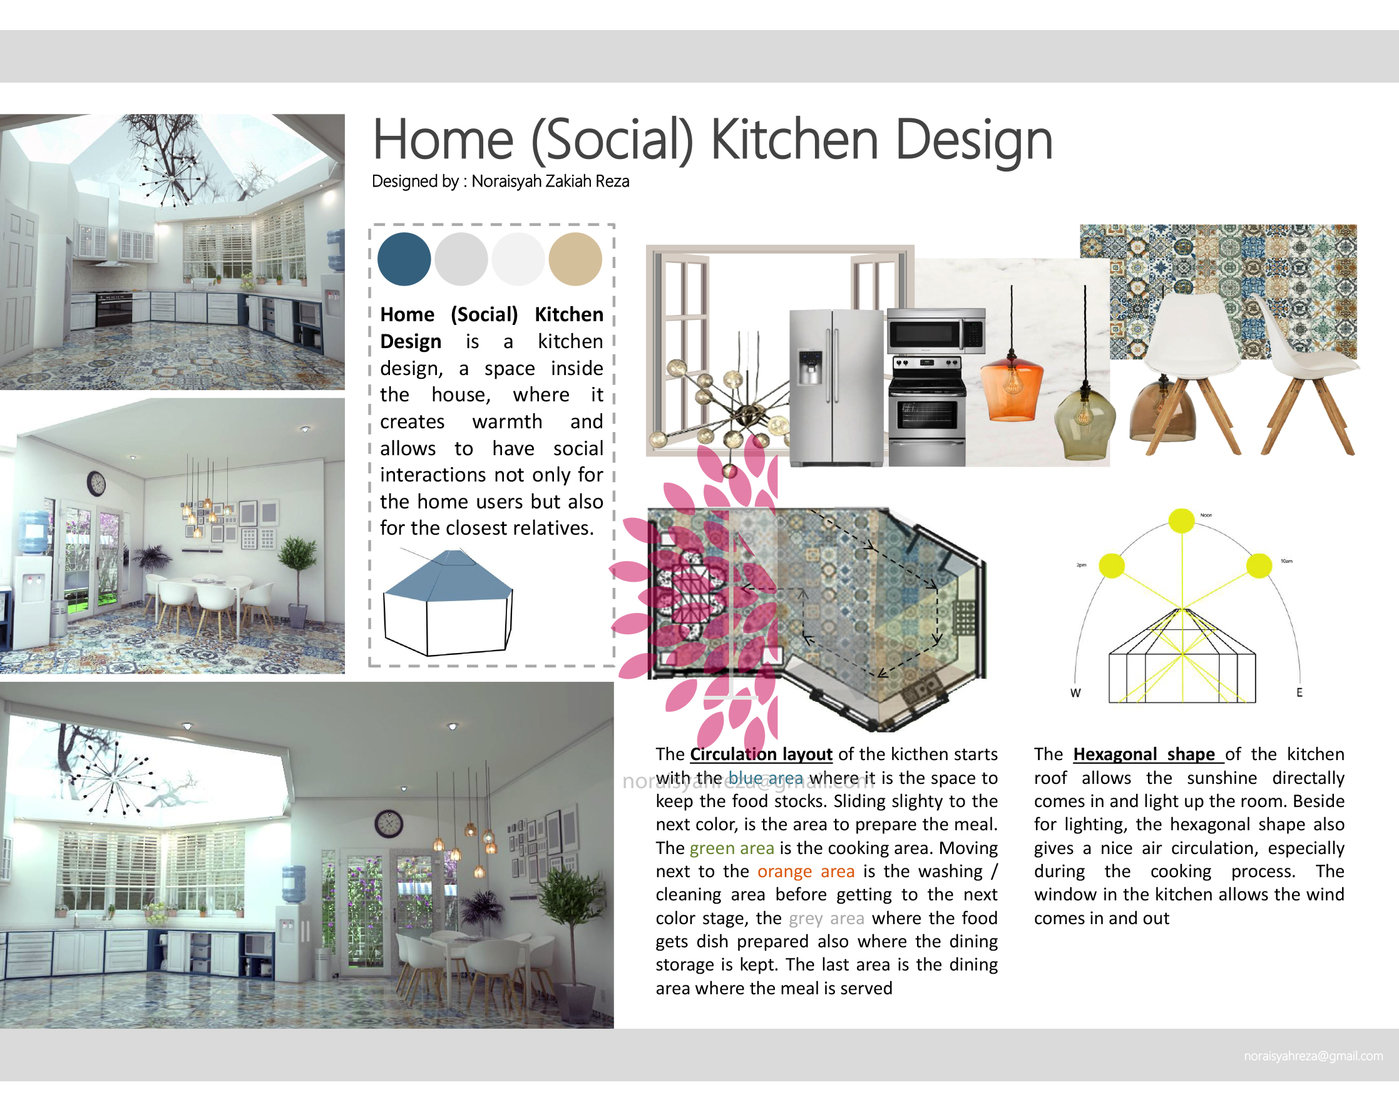 Social Kitchen Competition by Noraisyah Zakiah Reza at Coroflot.com